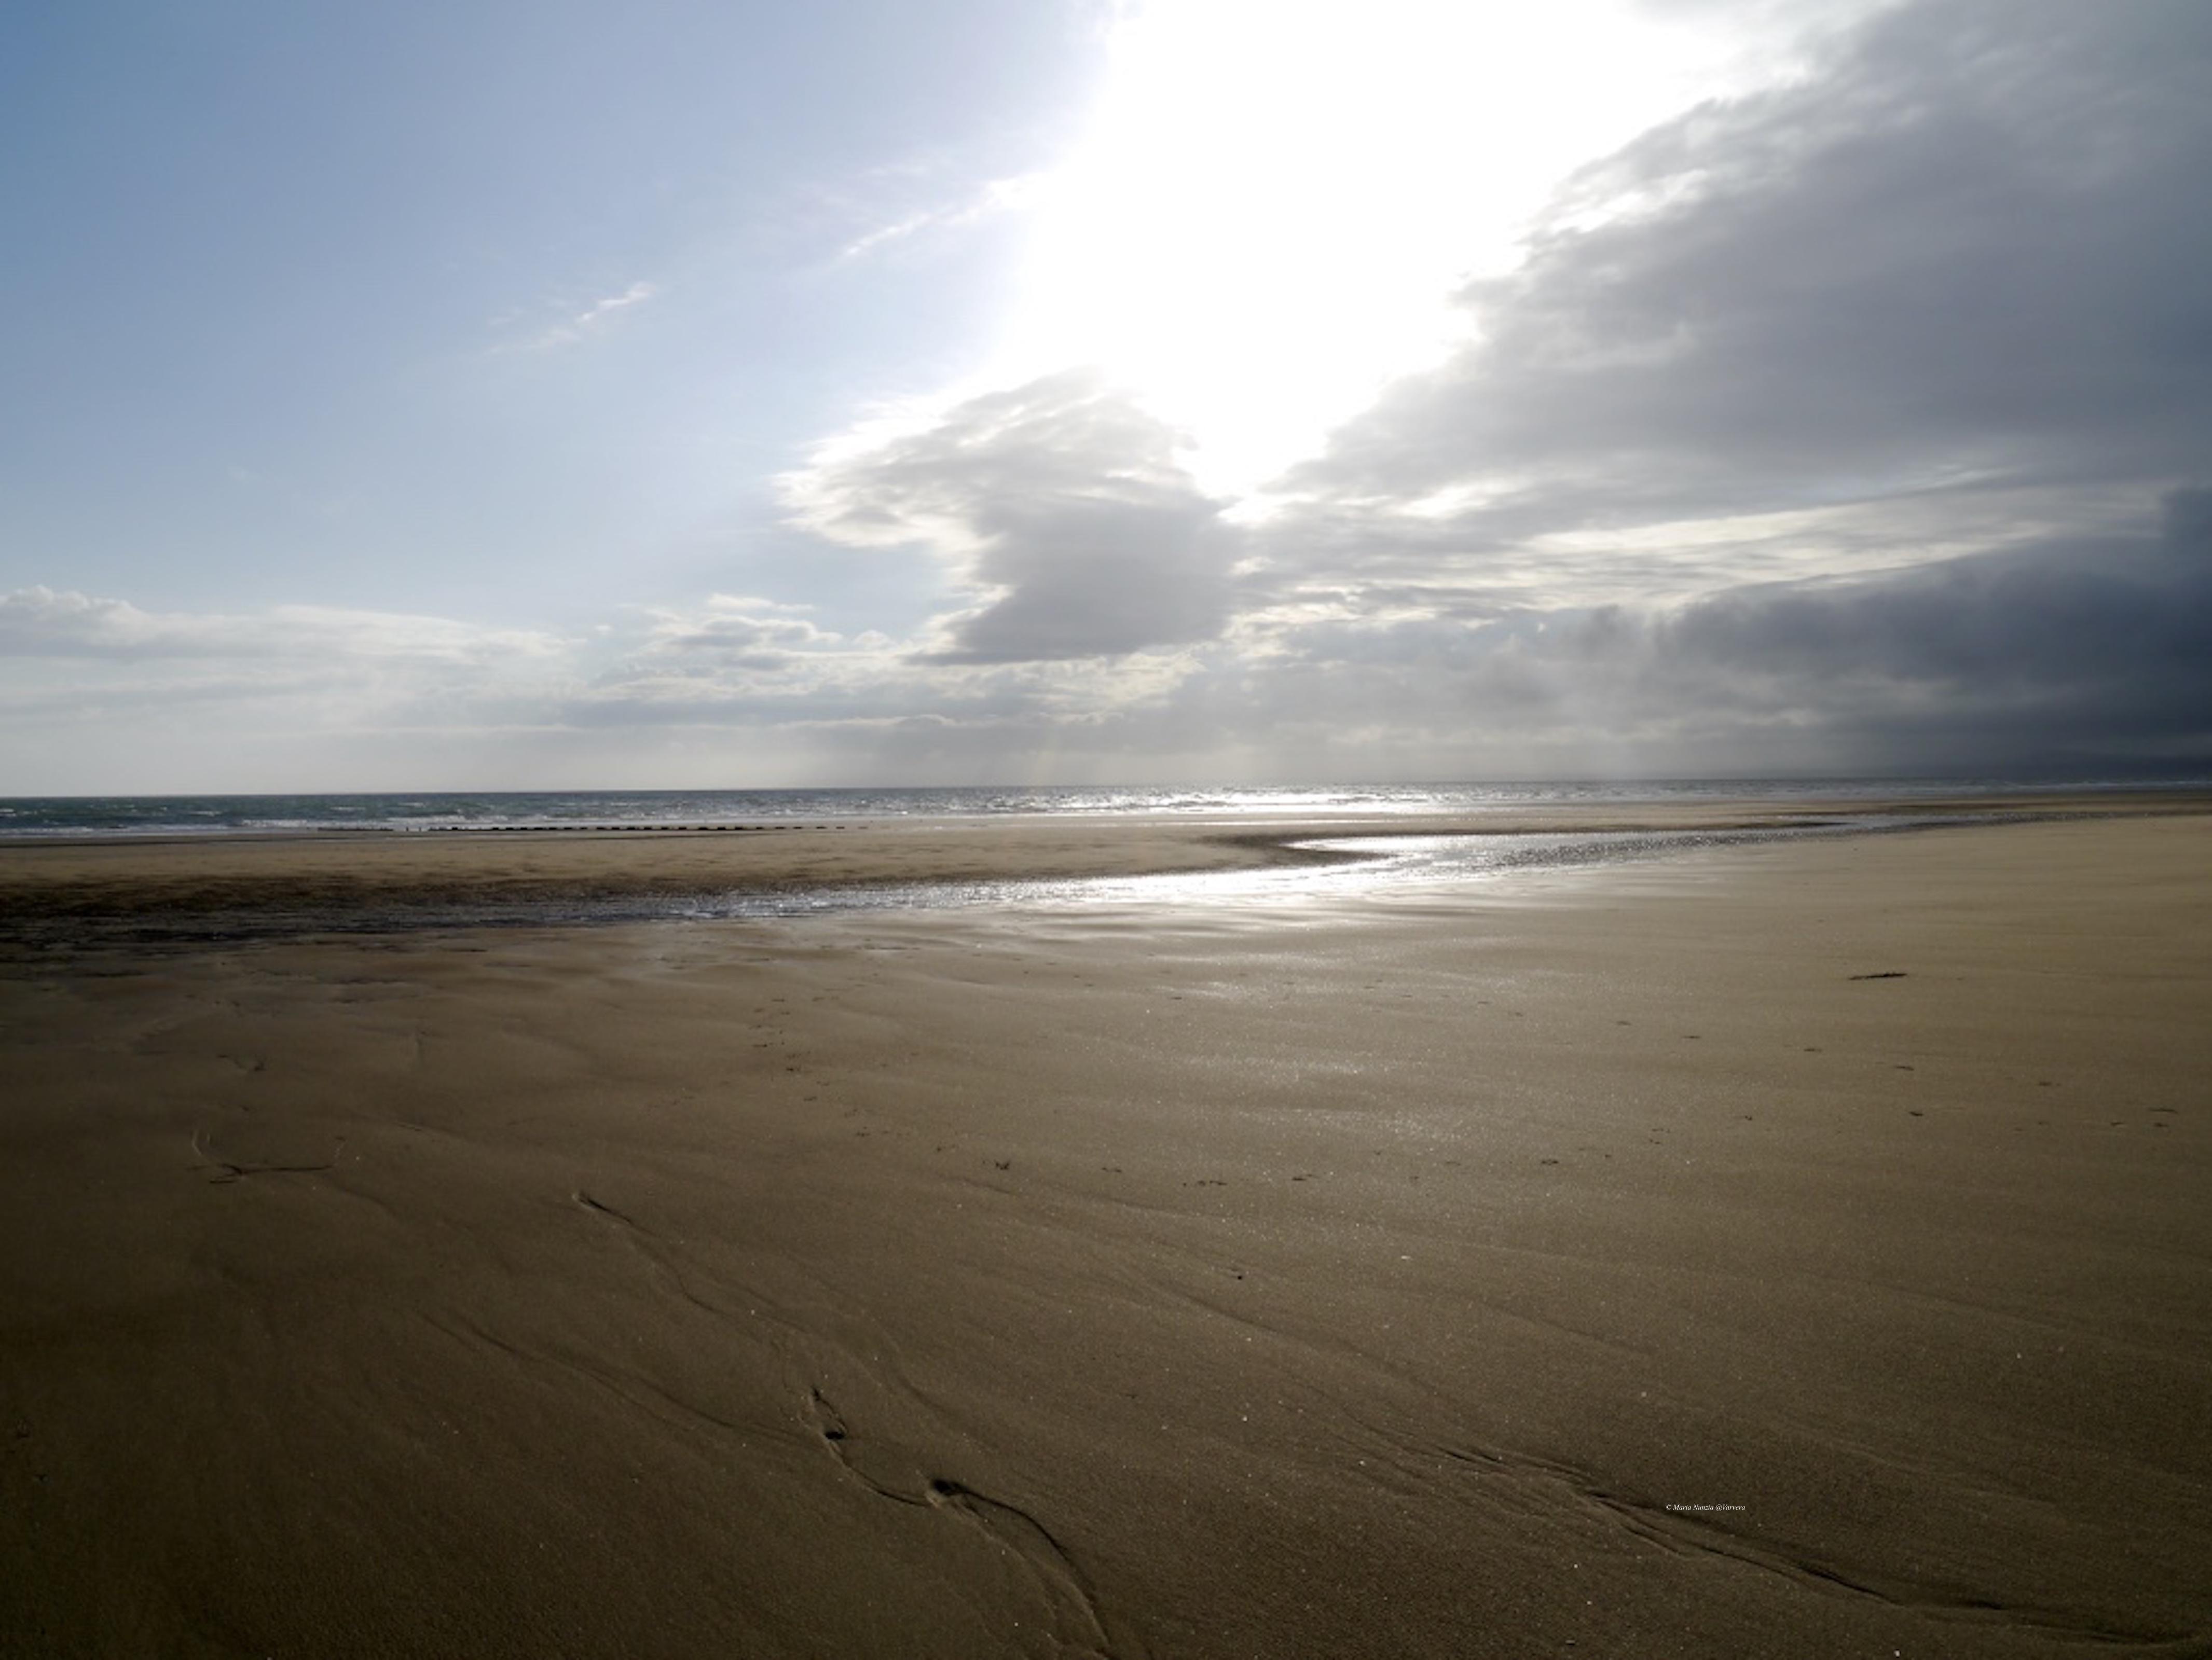 Morfa_Beach_©_Maria_Nunzia__Varvera_P1530650_1024_1024